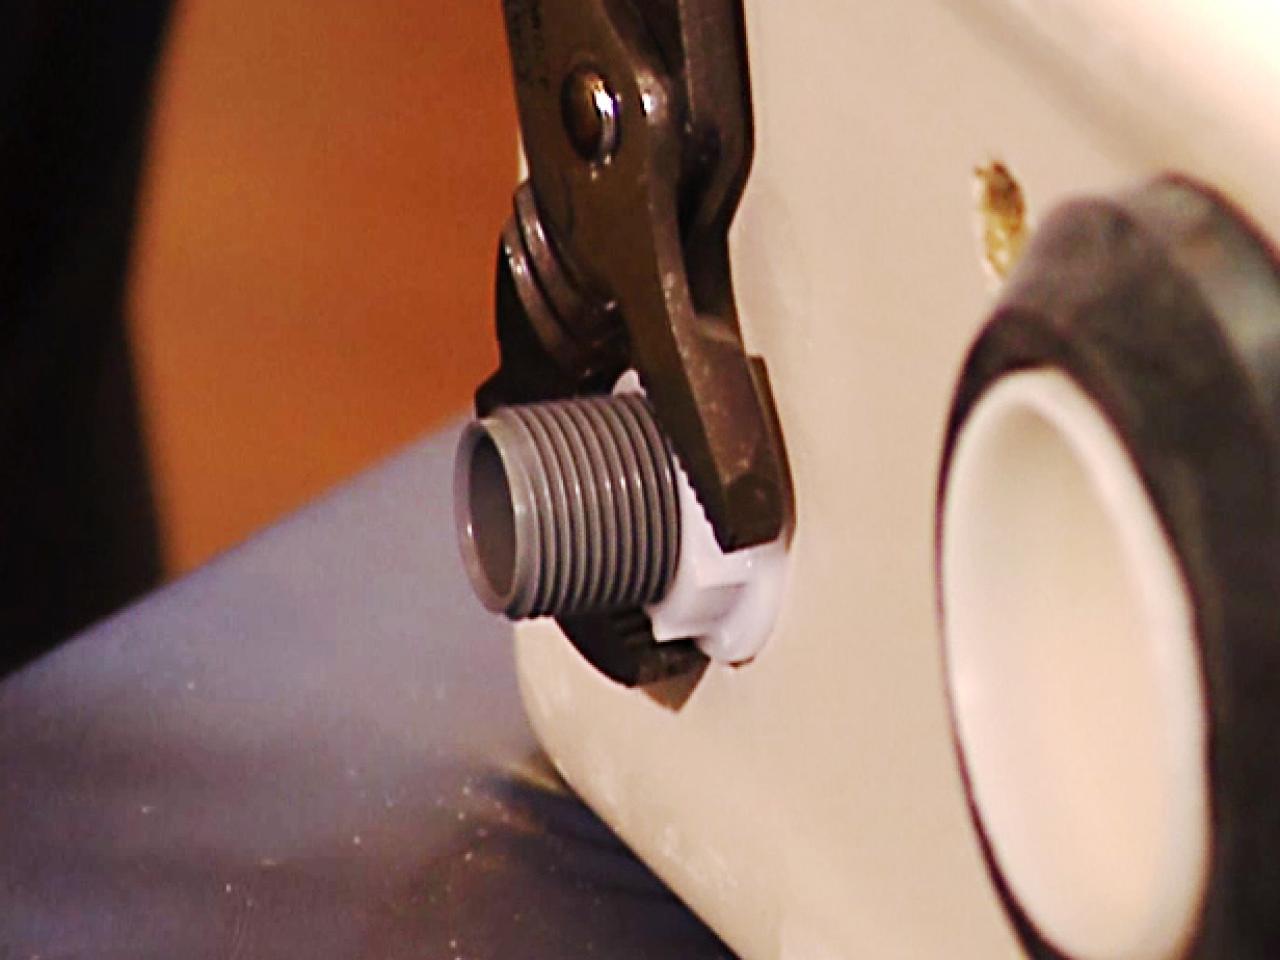 How To Rebuild A Toilet Tank How Tos Diy